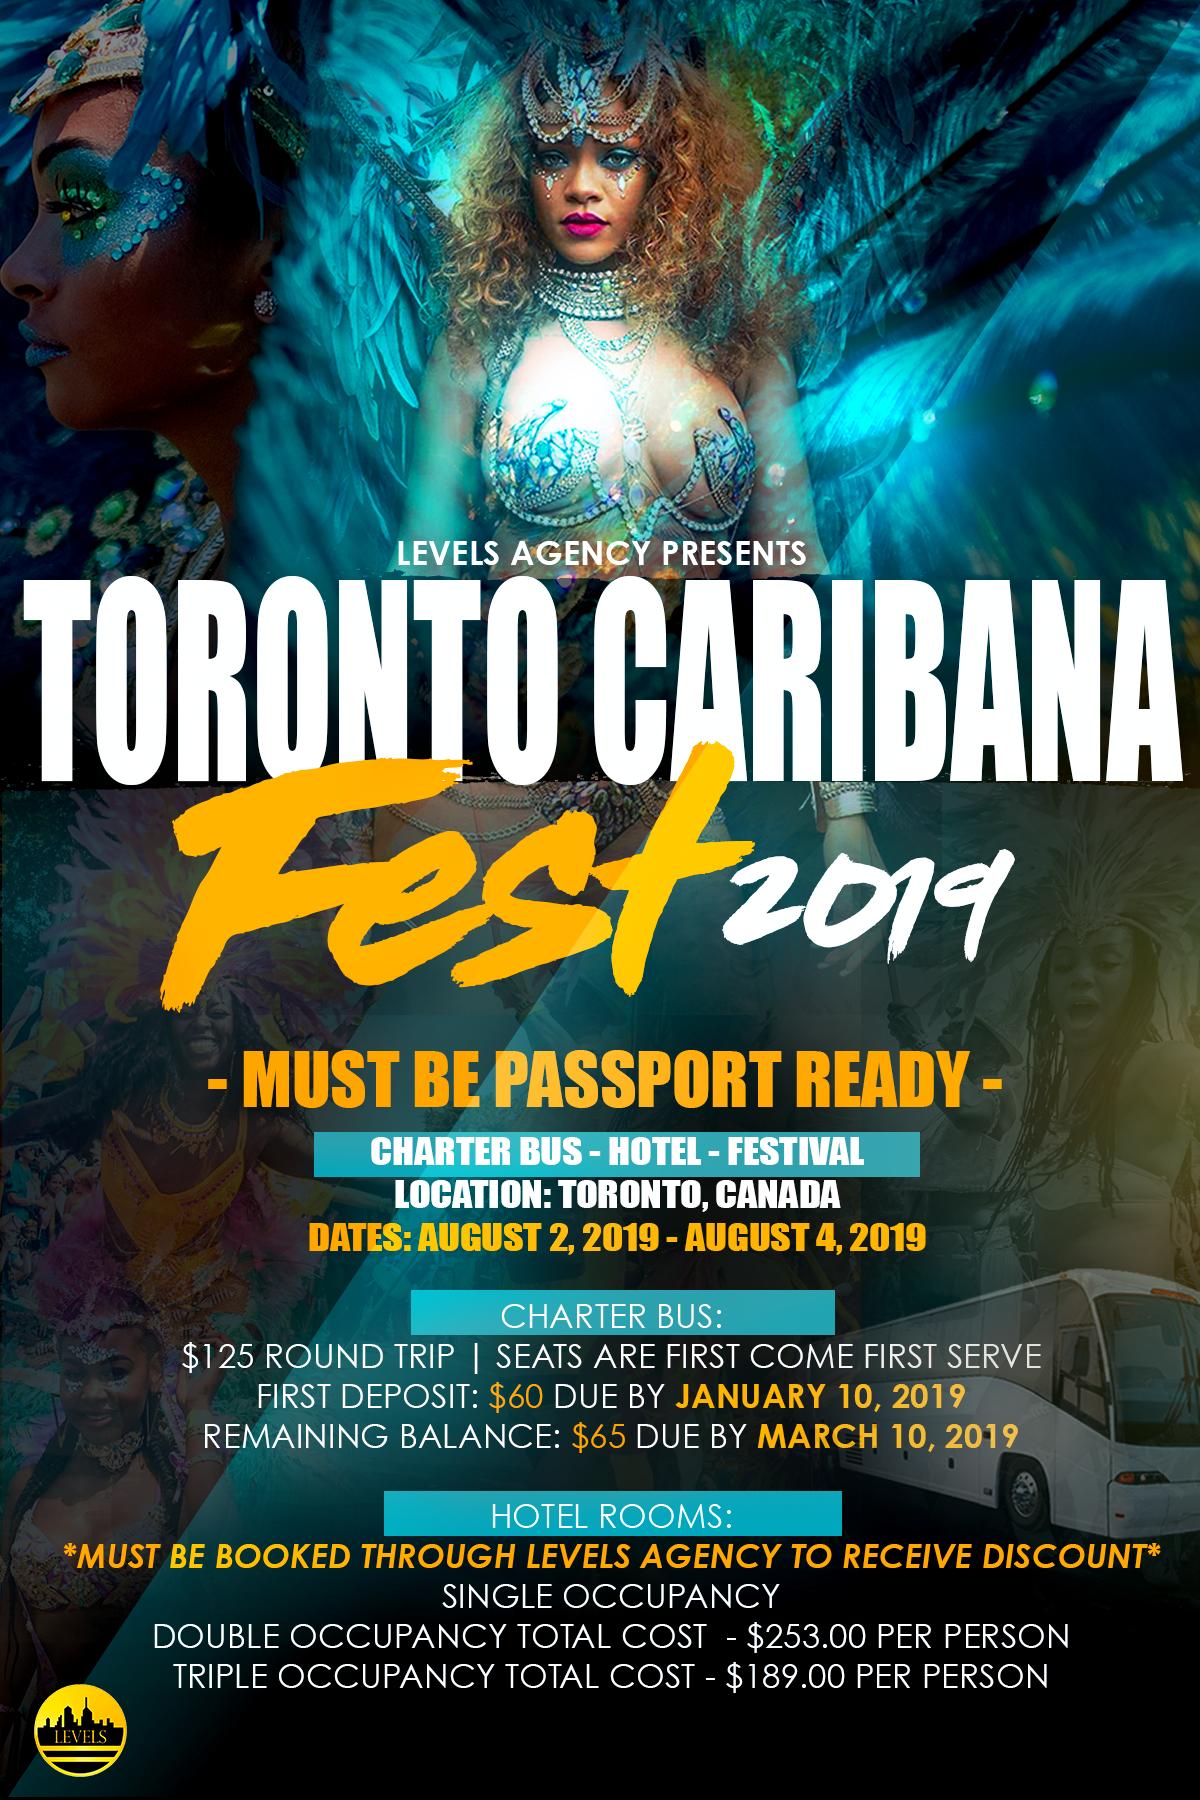 Toronto: The Caribana Festival Aug 2nd - Aug 4th, 2019